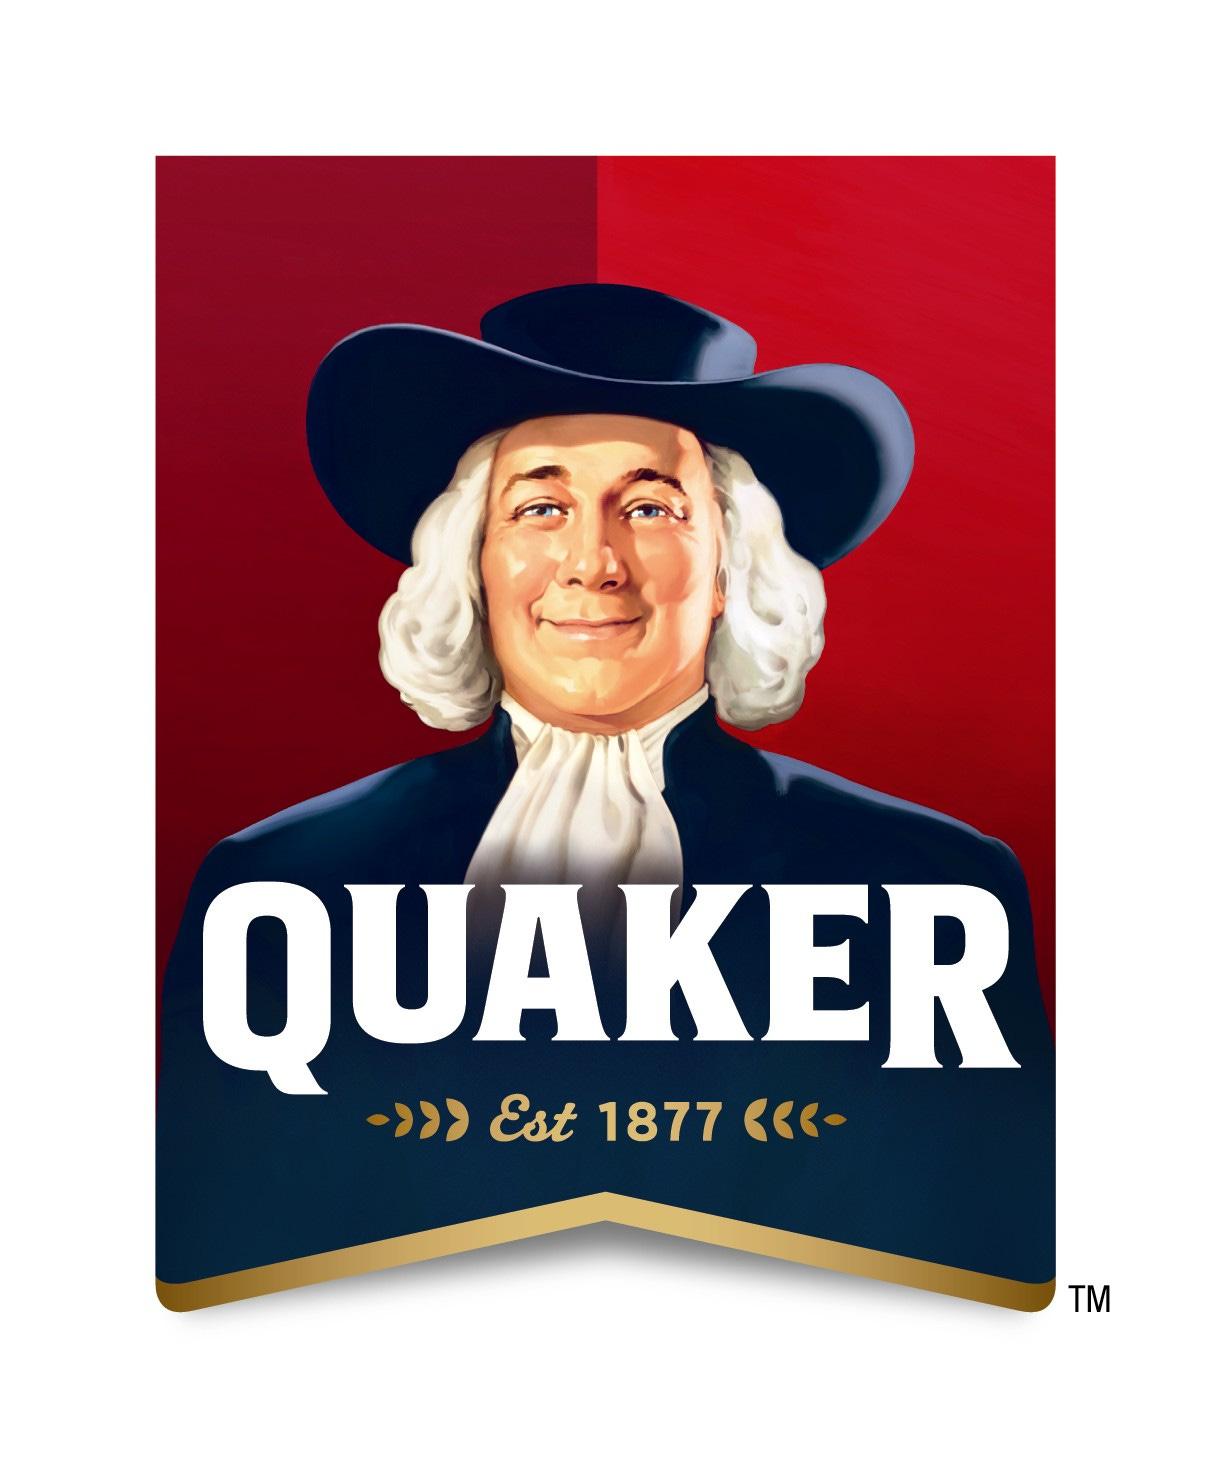 Quaker Oats | Ethics of Design